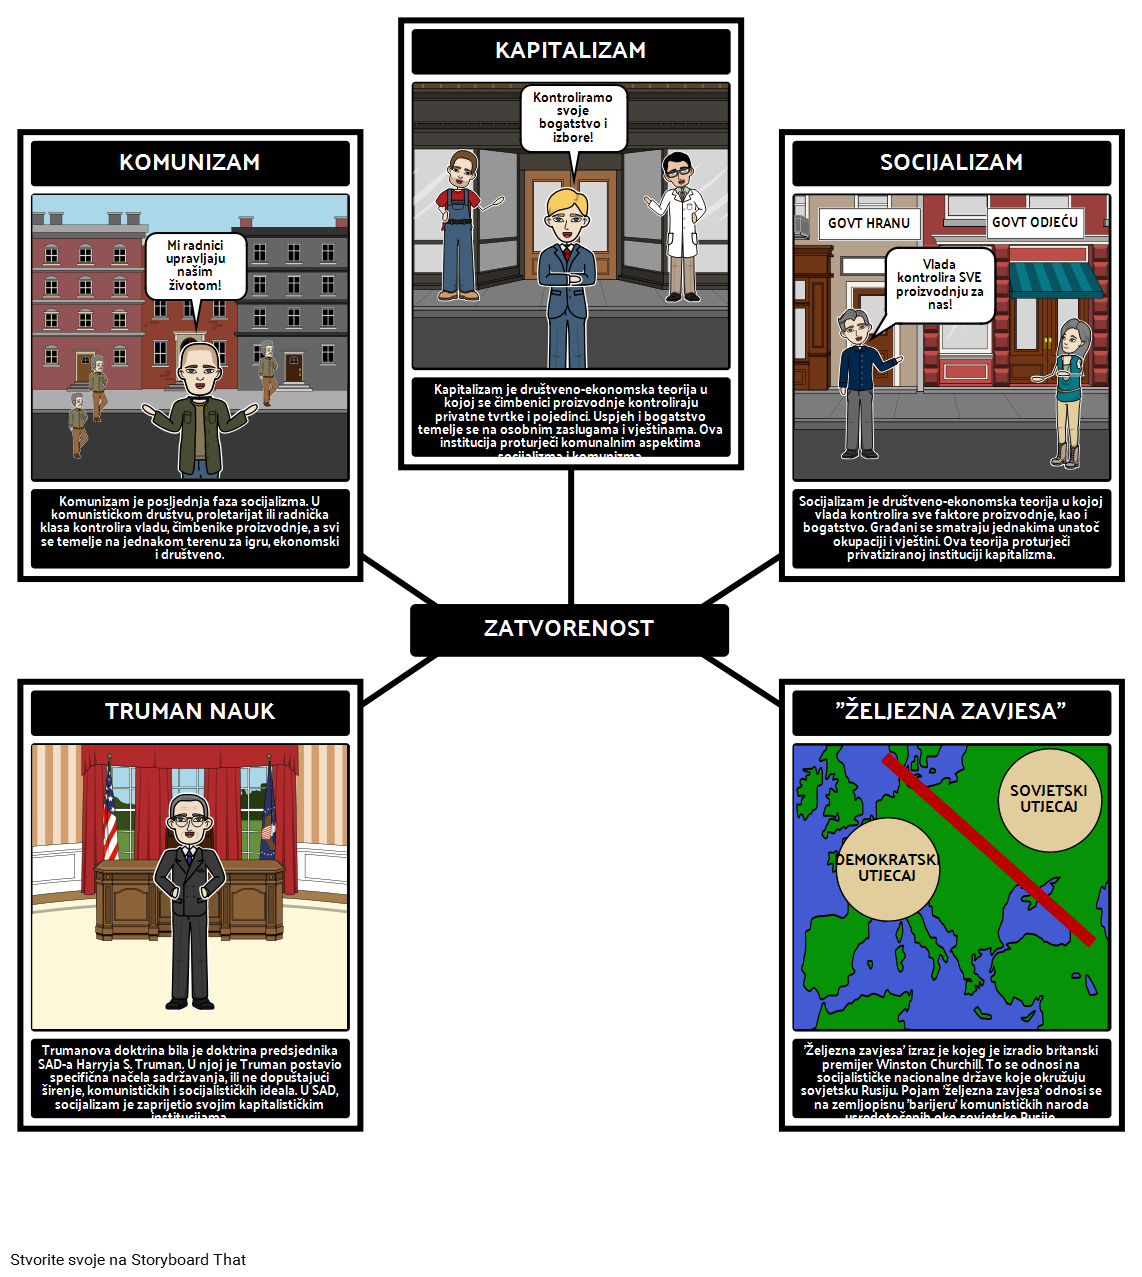 Trumanova Predsjedništva - Spider Map of Containment Policy